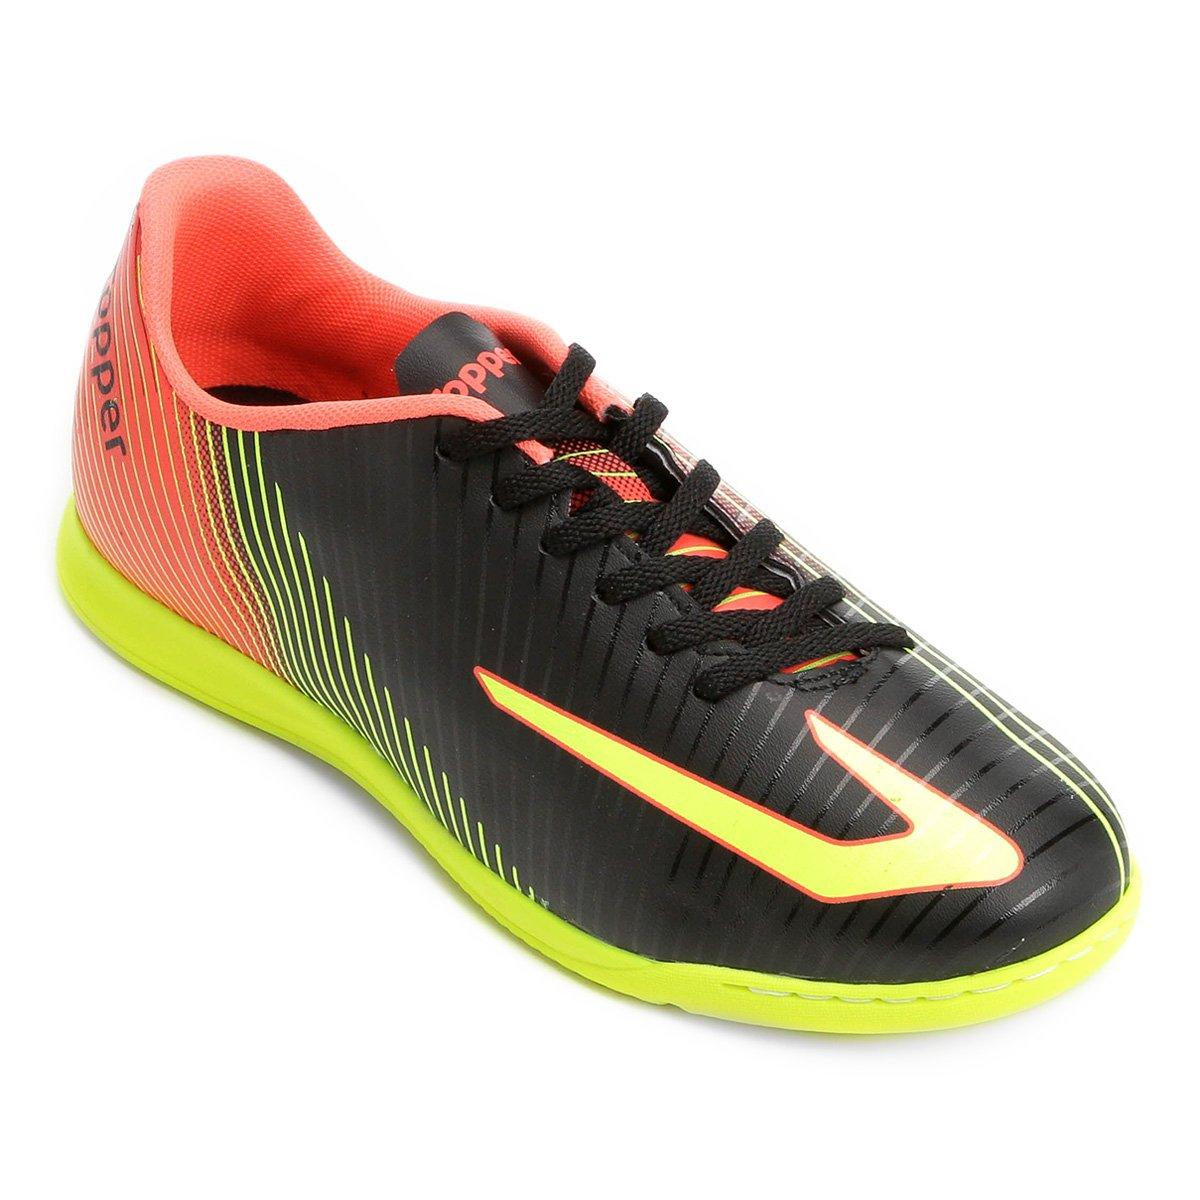 f955d5748 Chuteira Futsal Topper Ultra